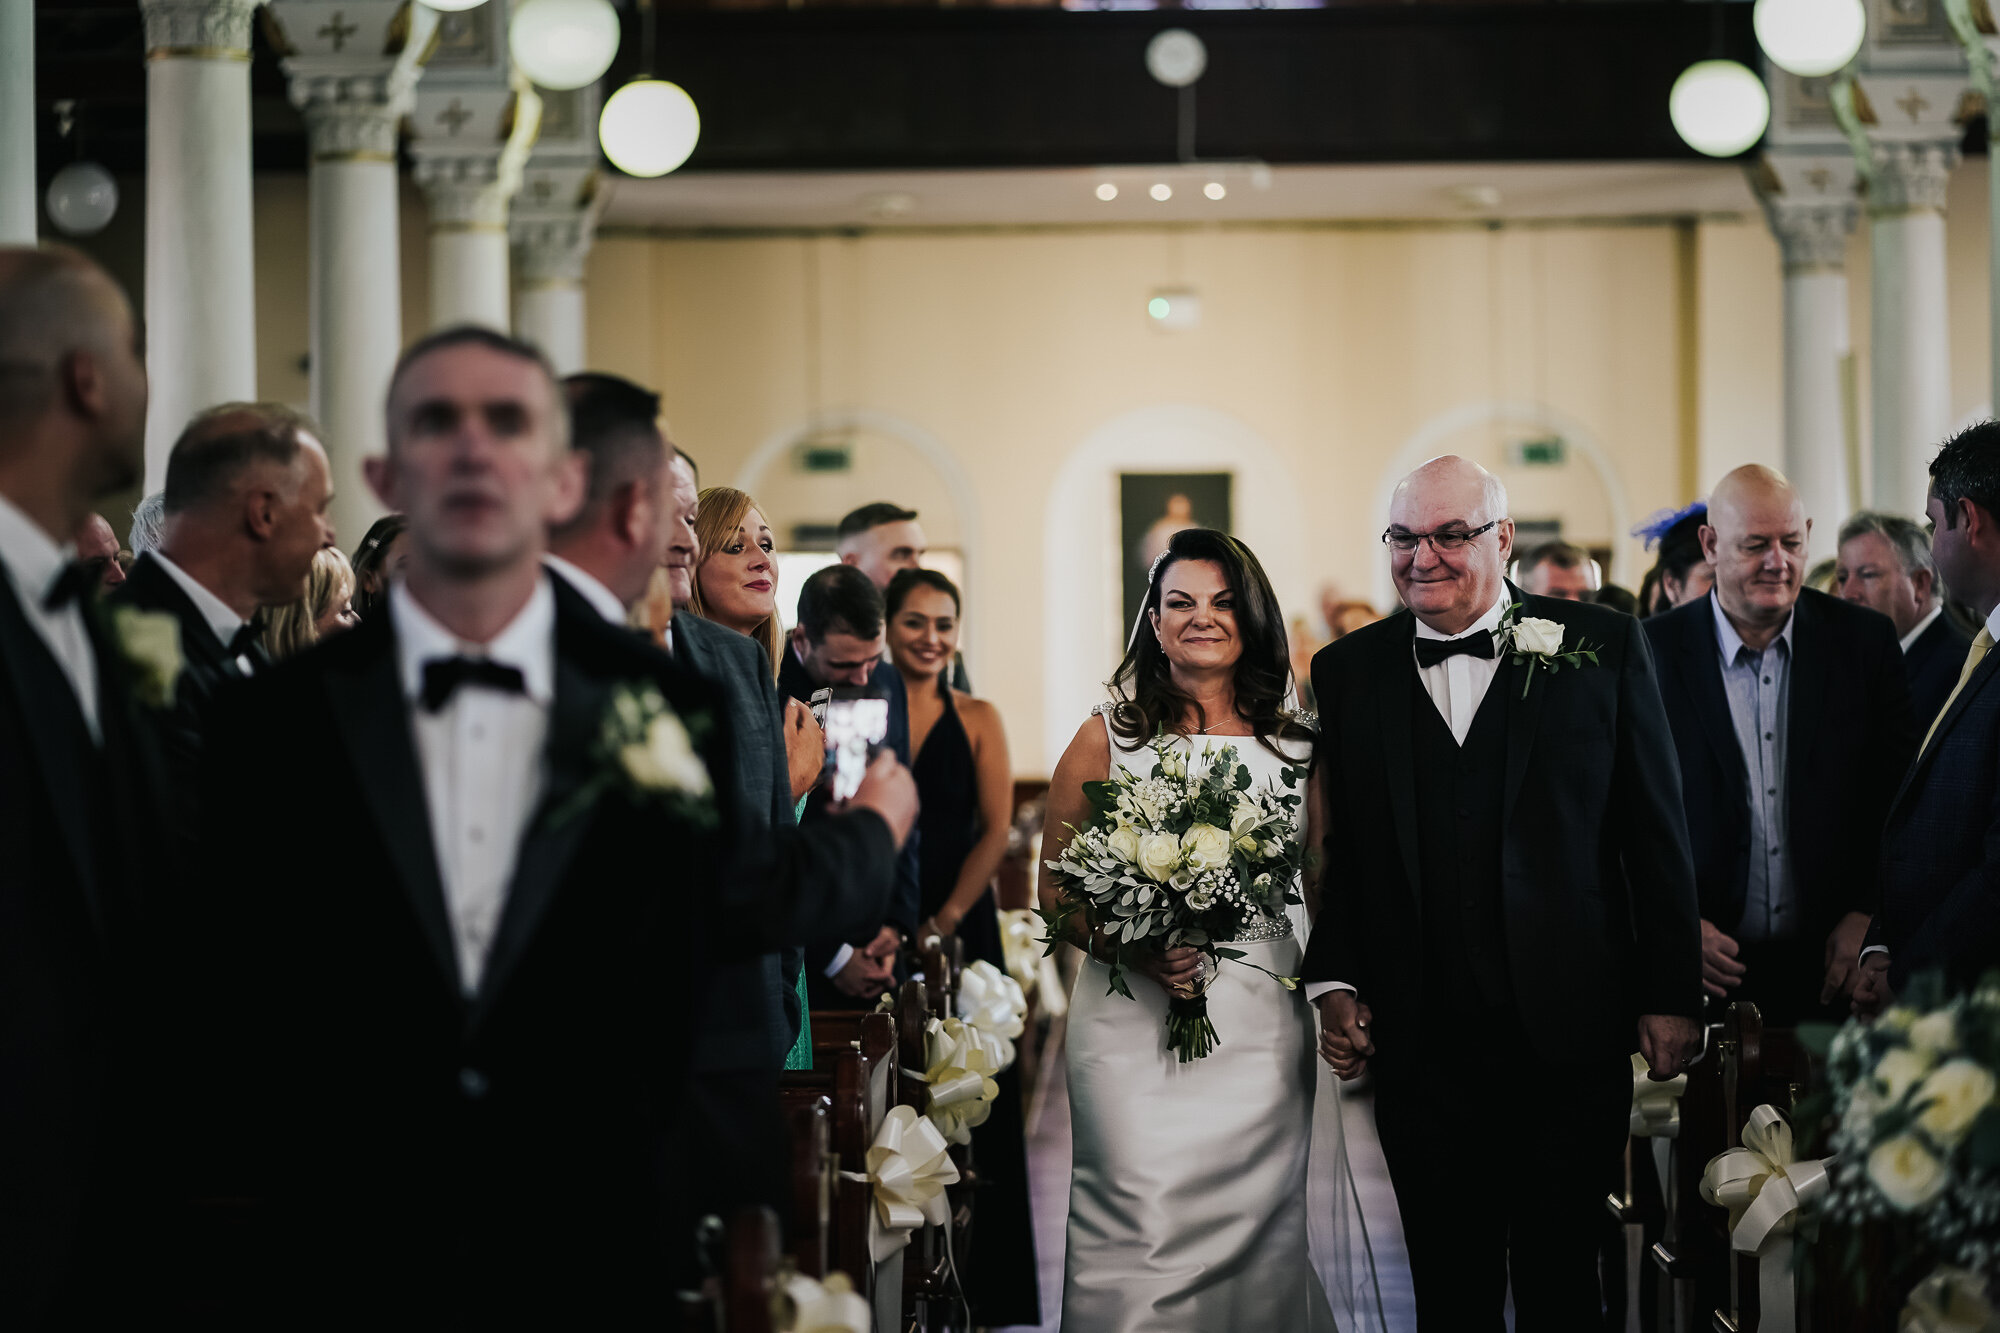 Clontarf Caste wedding photographer Wedding Photography dublin ireland wedding photographer (22 of 58).jpg